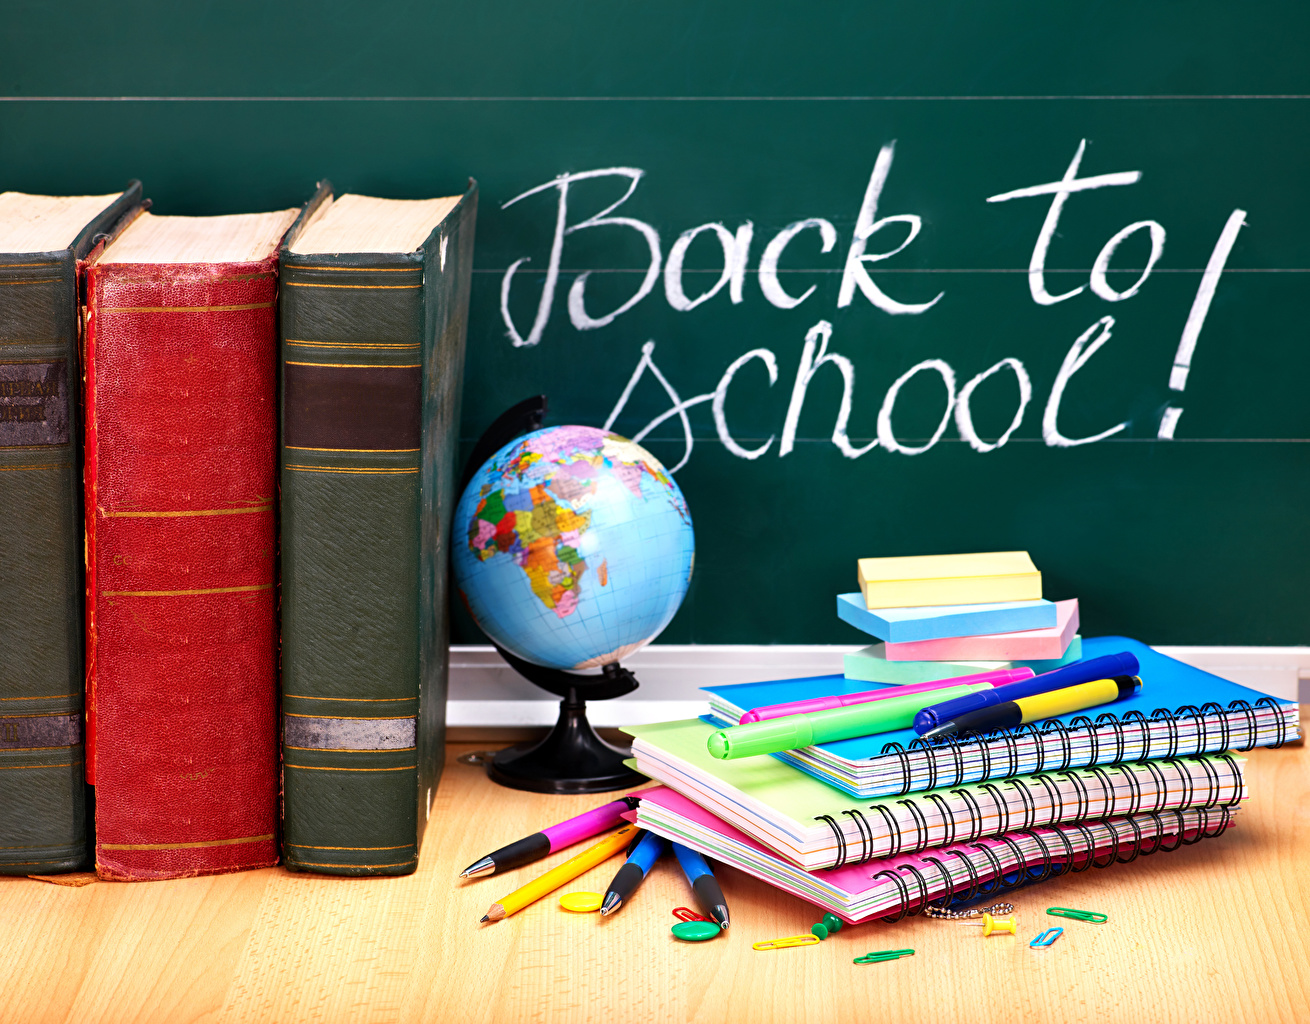 Photos School English Globe Ballpoint pen Notebooks Book books